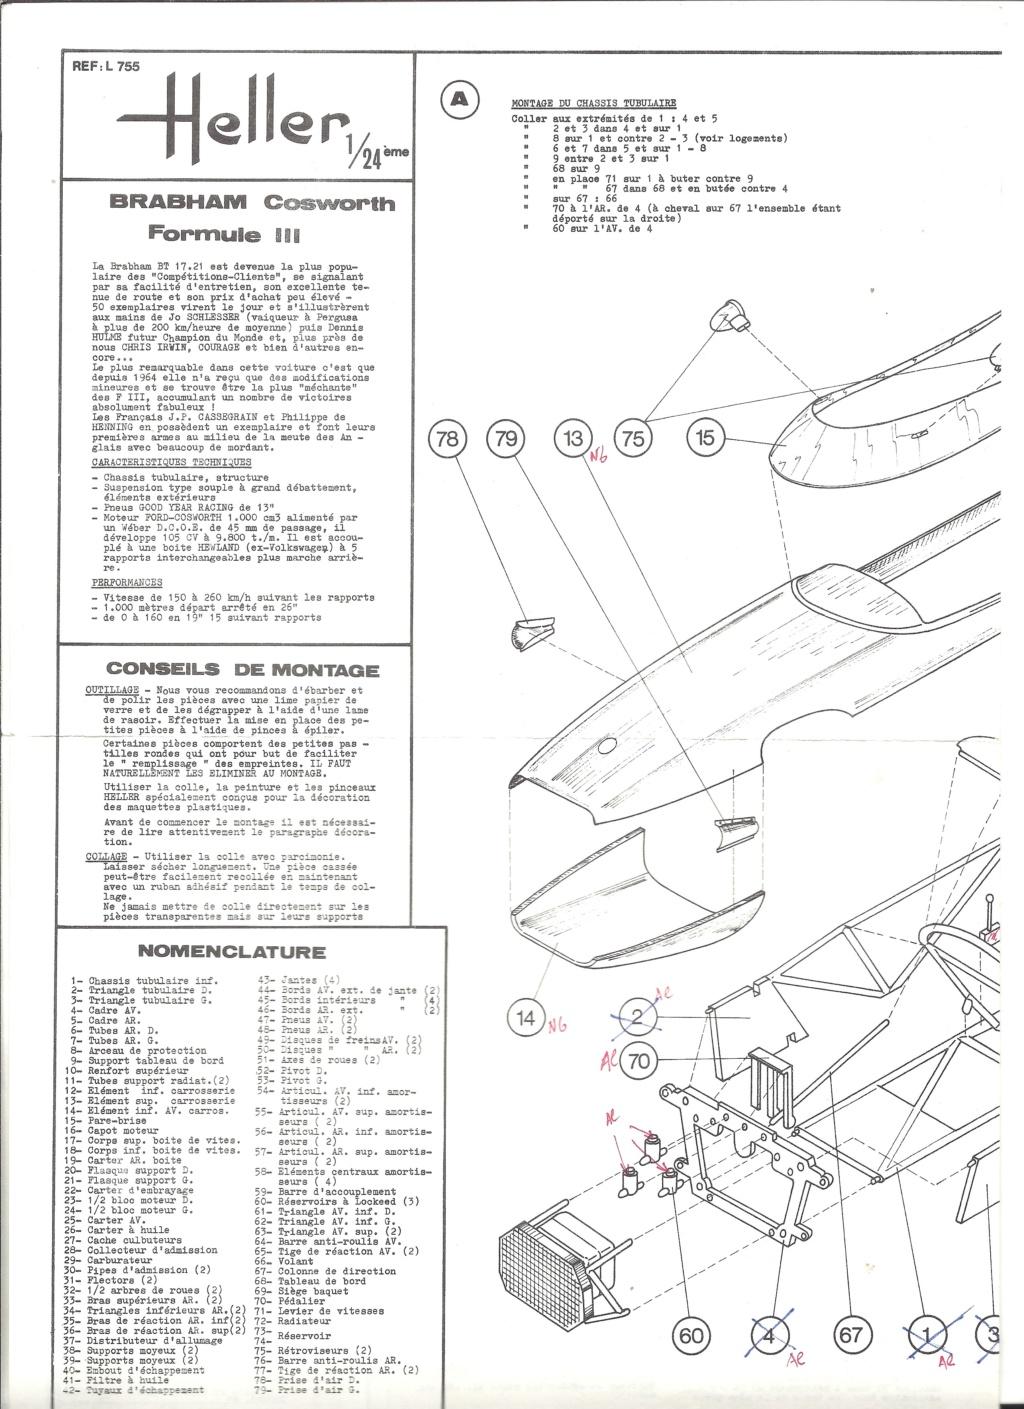 BRABHAM COSWORTH Formule III 1/24ème Réf L755 Notice Helle195